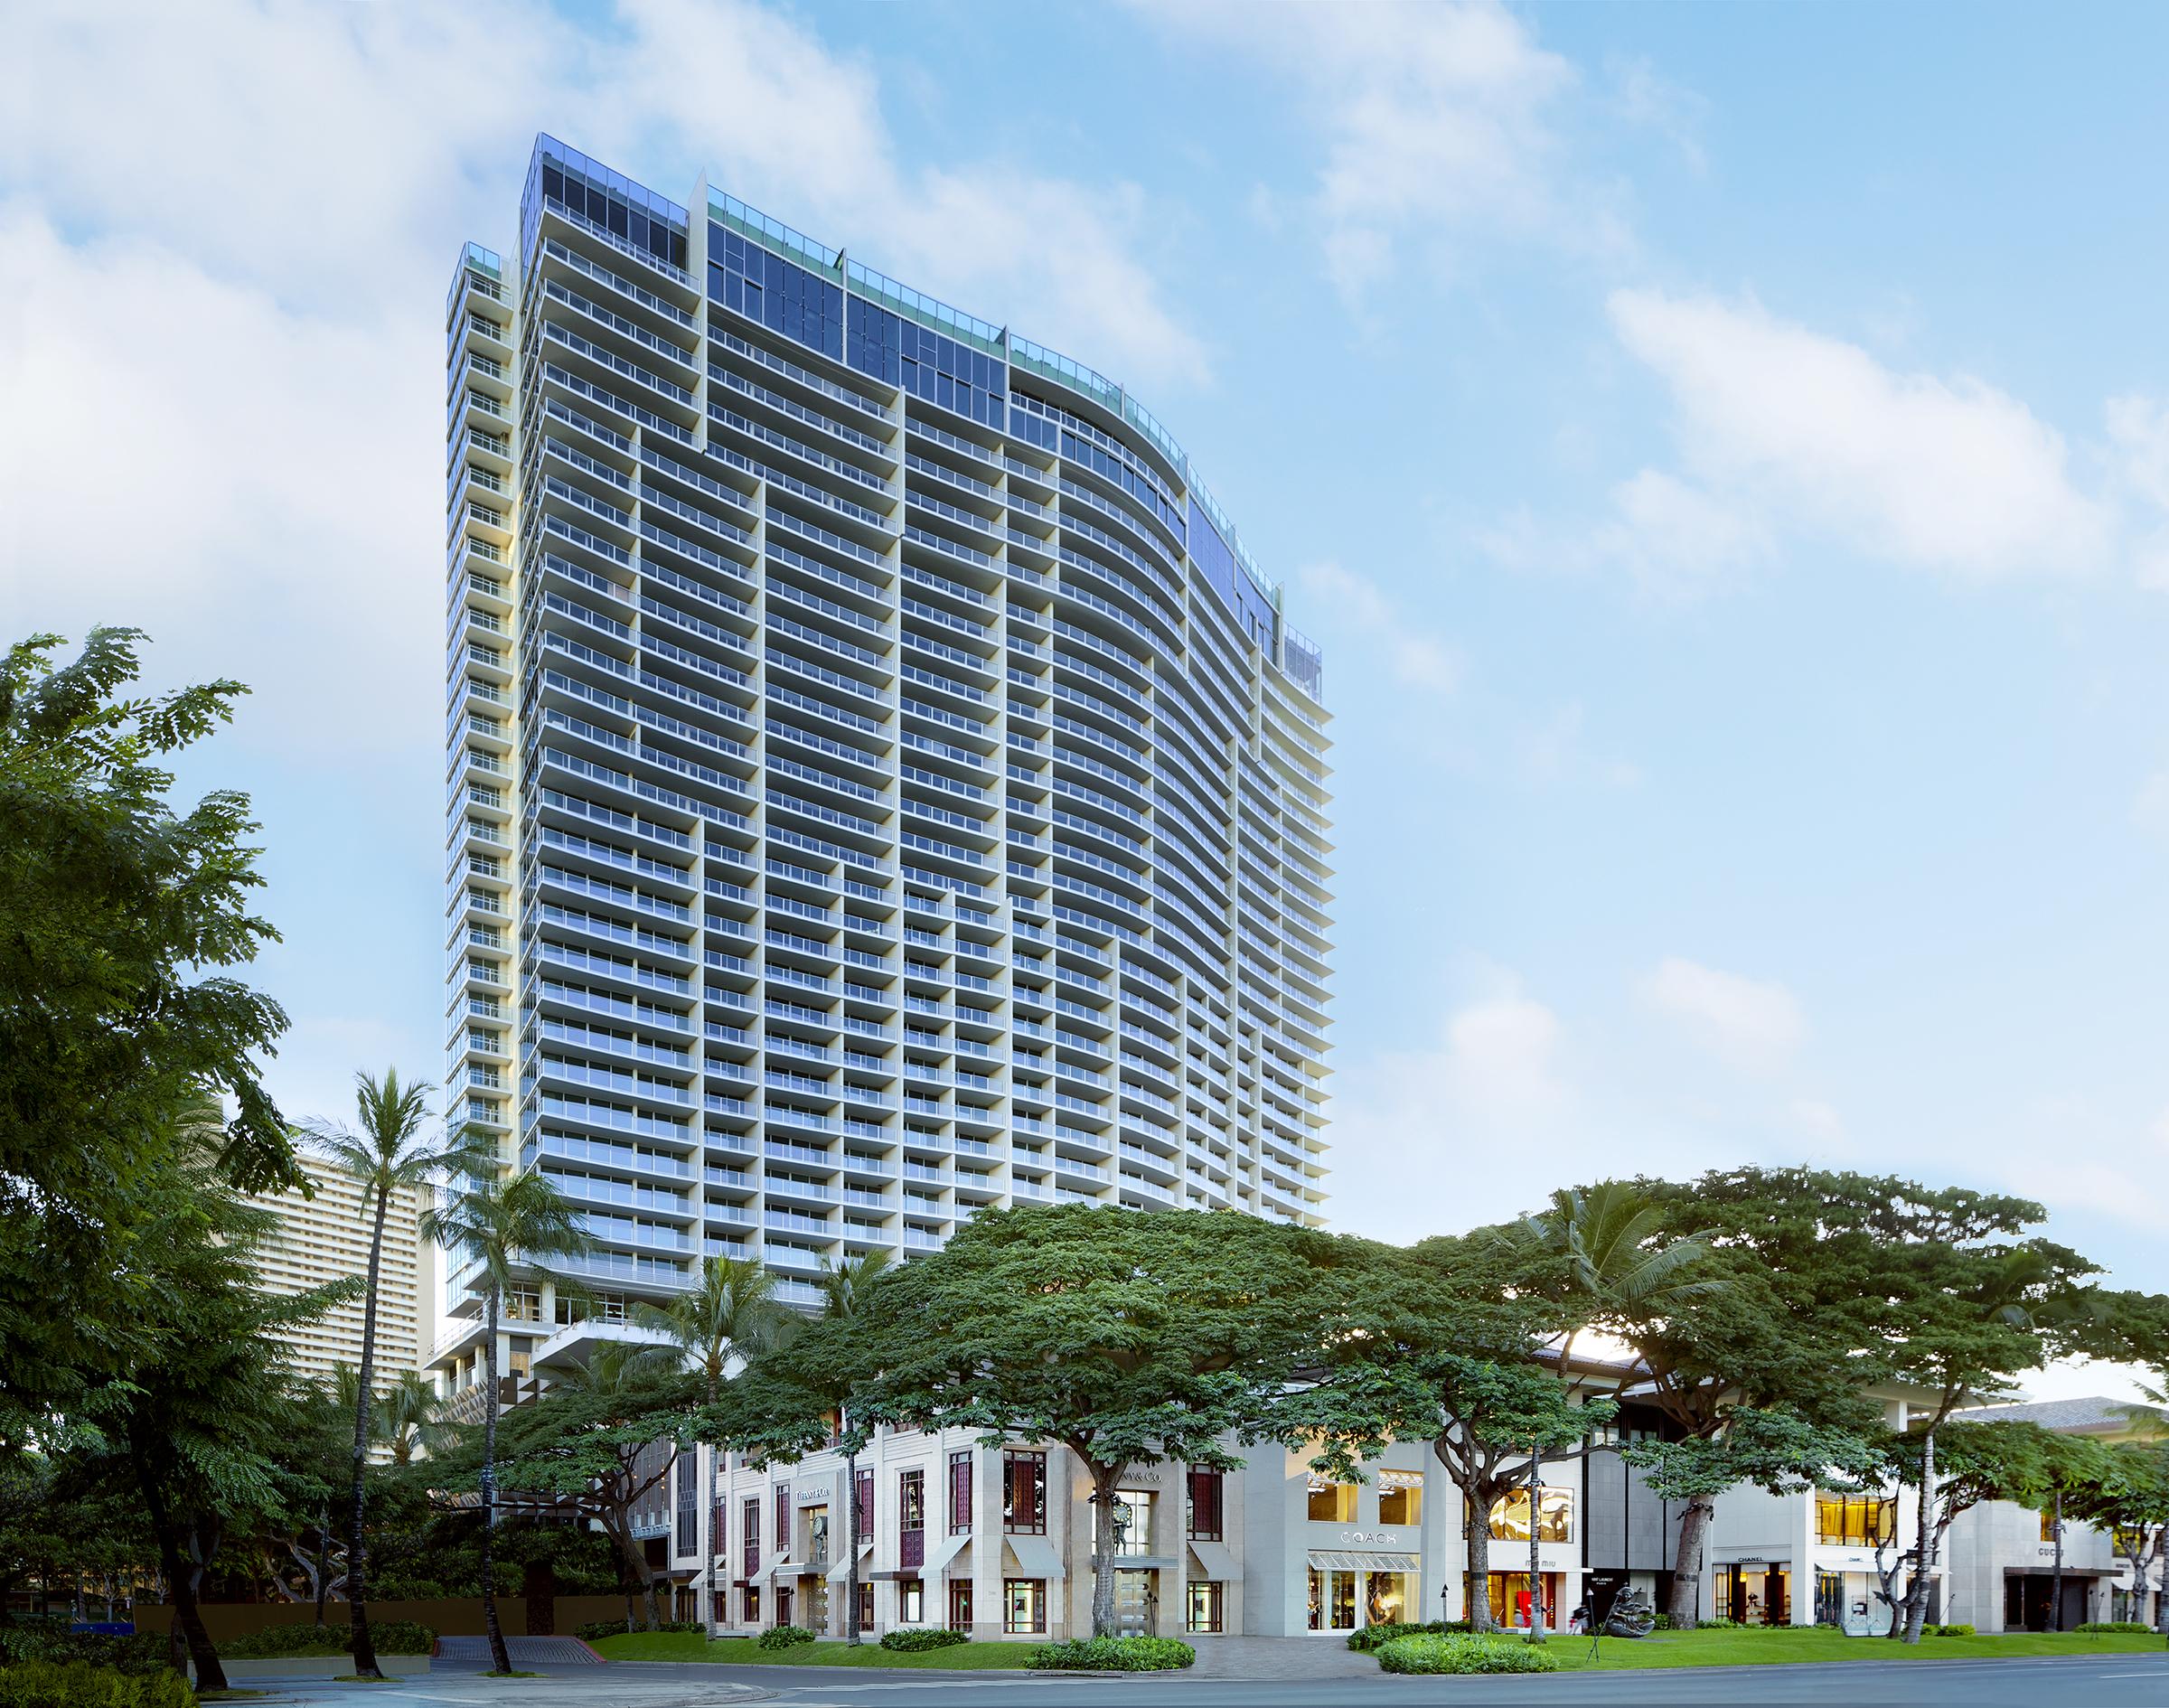 The Ritz-Carlton Residences, Waikiki Beach, Honolulu